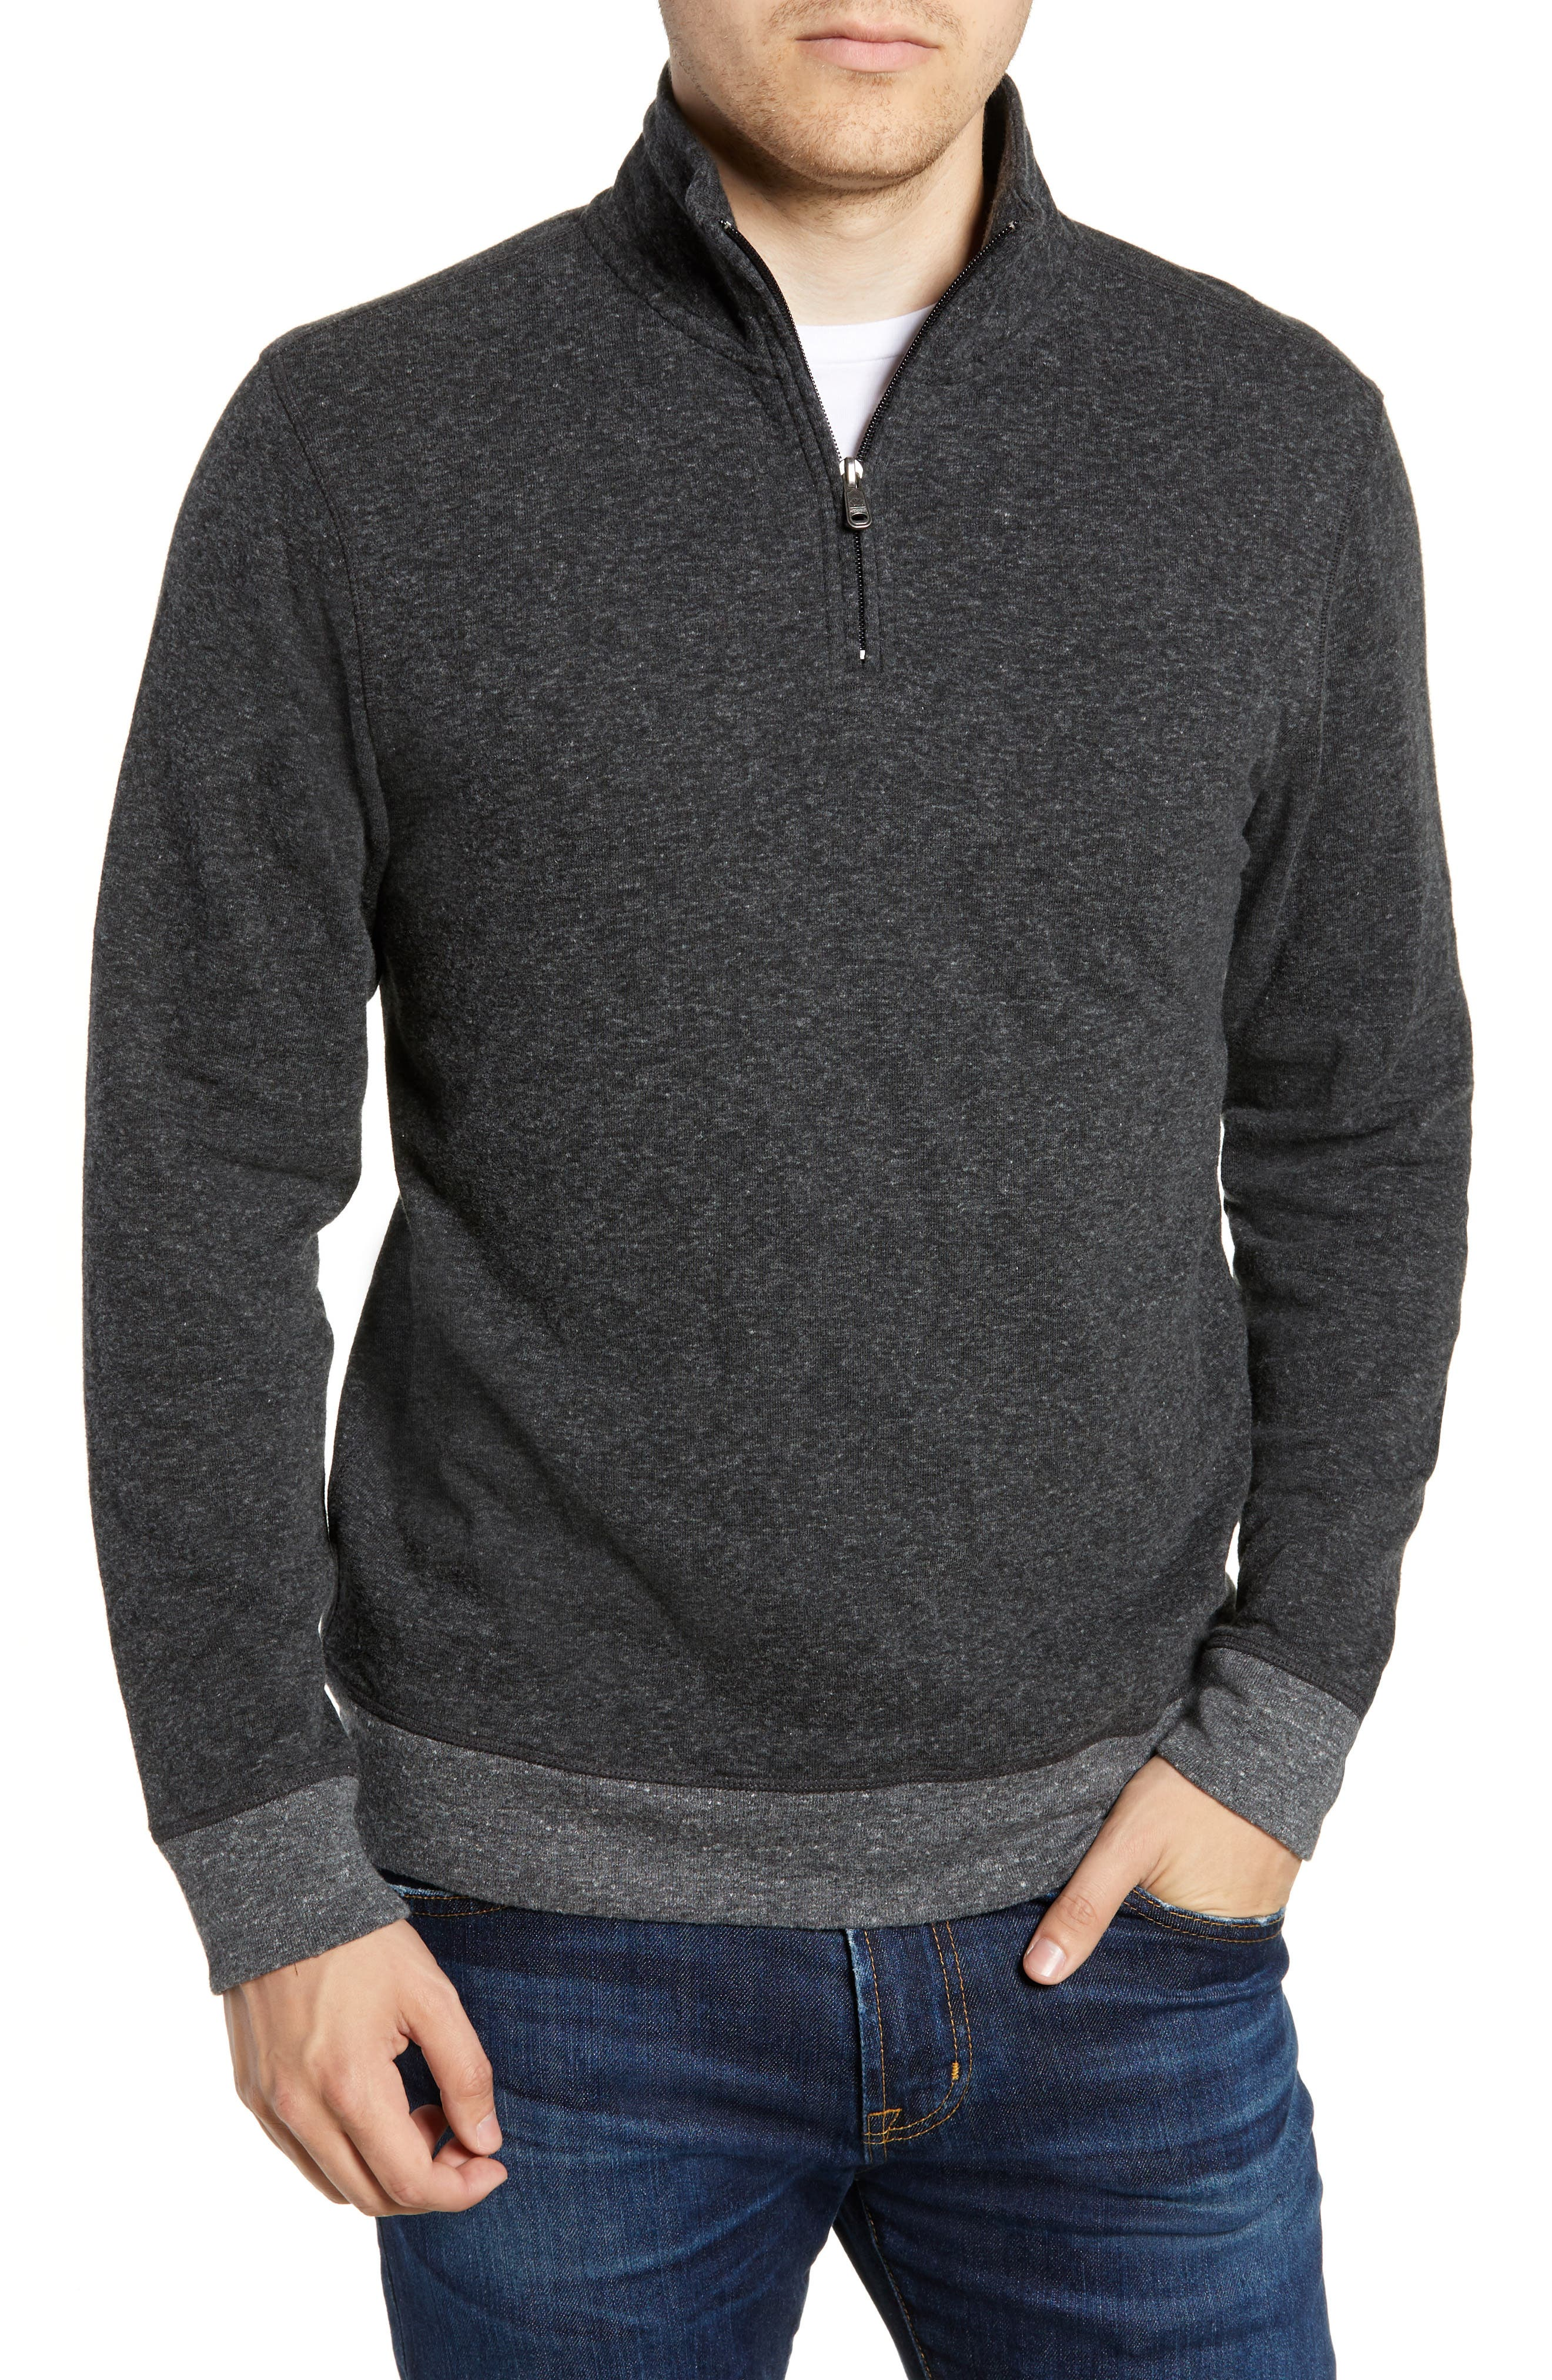 Dual Knit Regular Fit Quarter Zip Pullover,                             Main thumbnail 1, color,                             WASHED BLACK